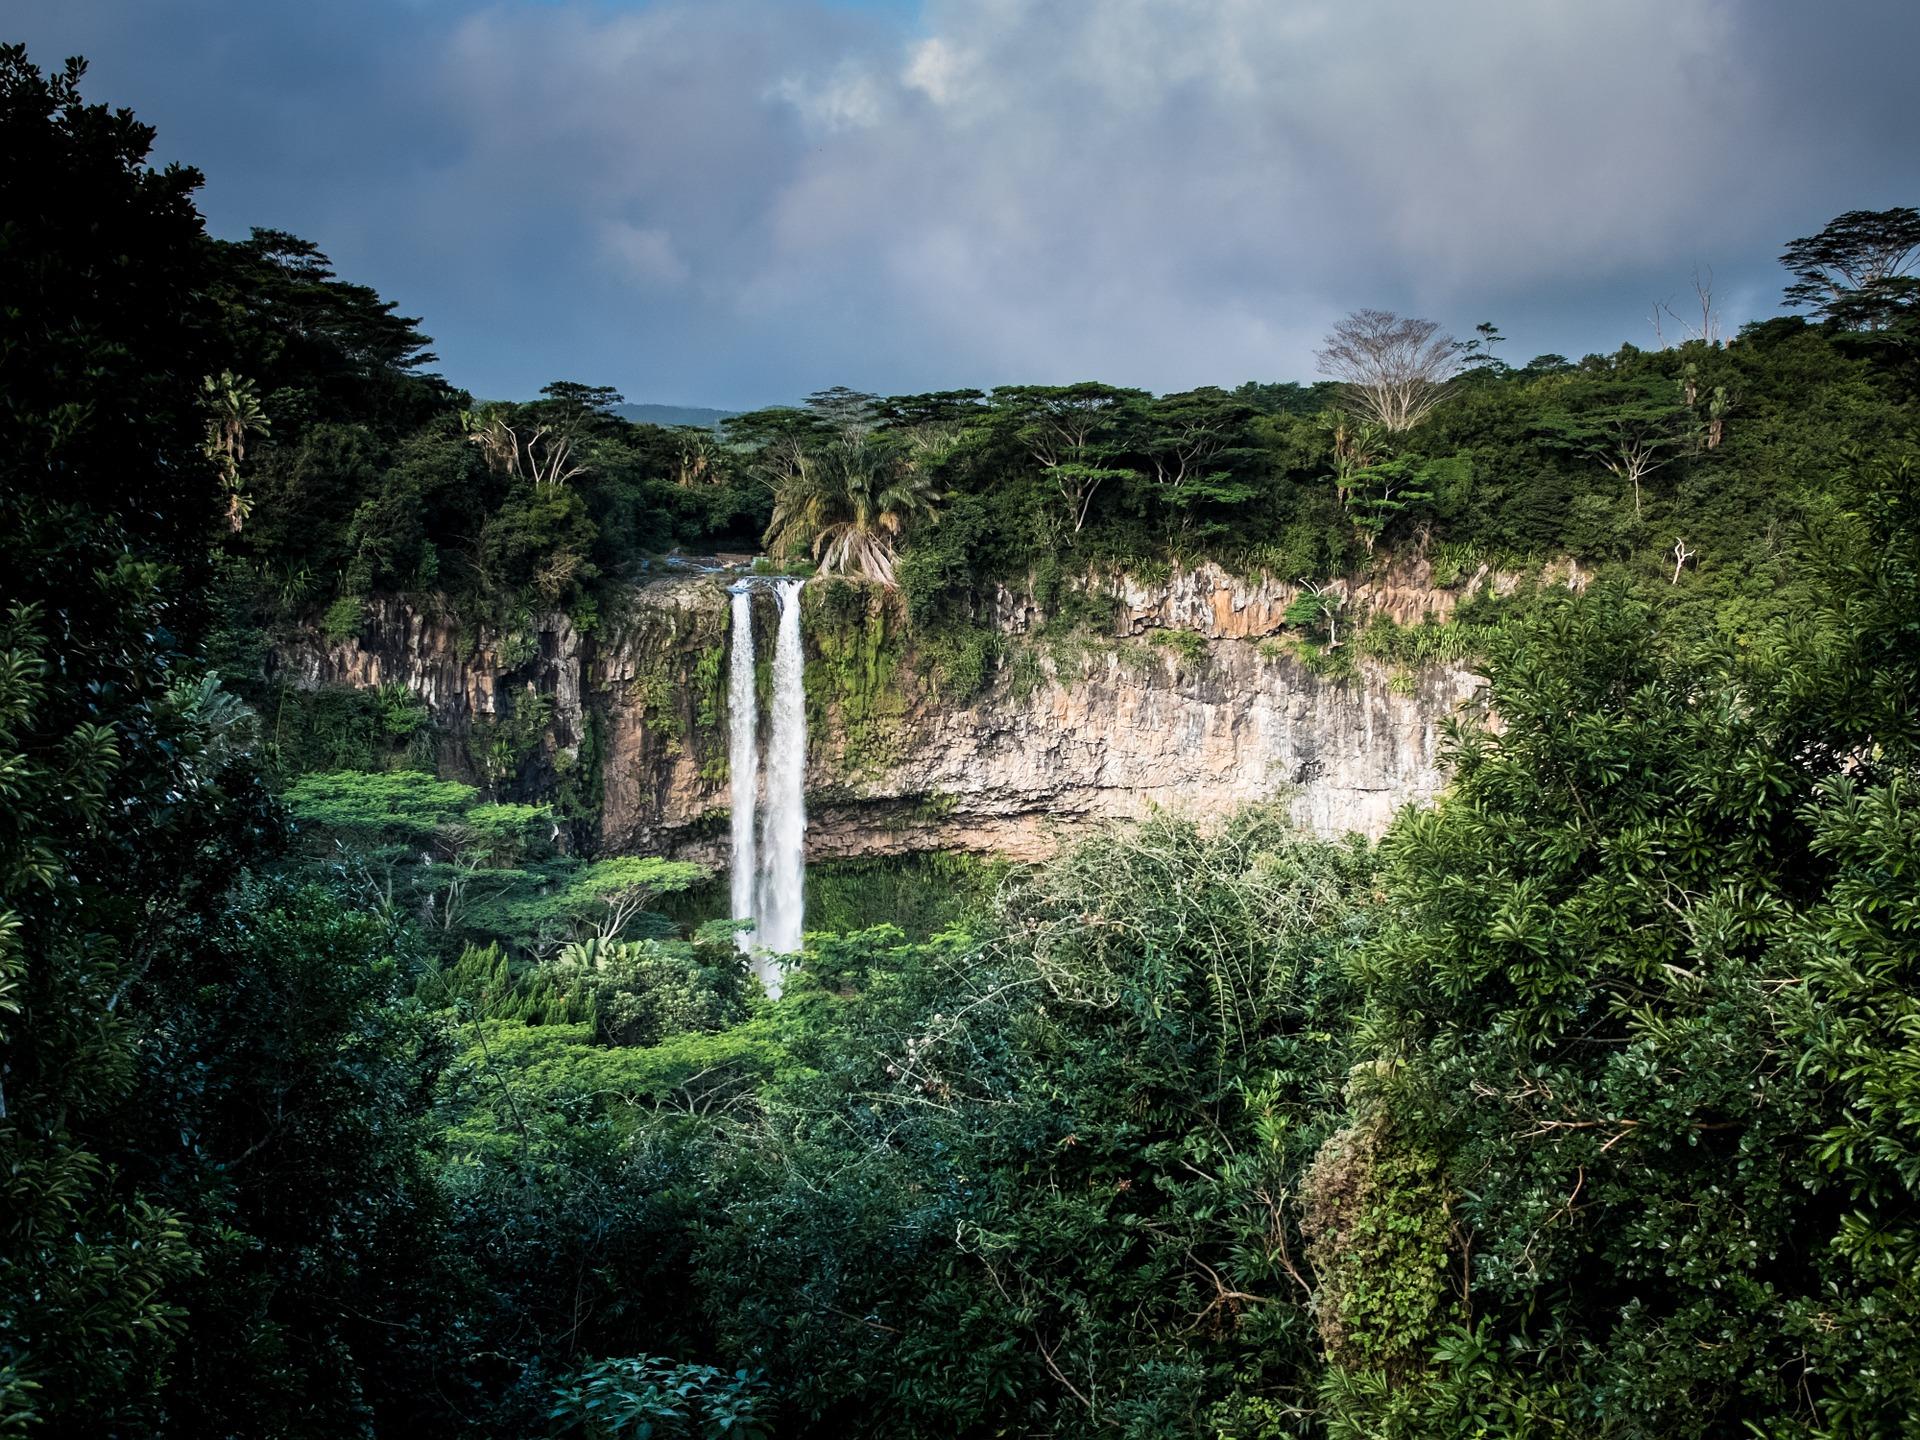 waterfall-1030737_1920.jpg